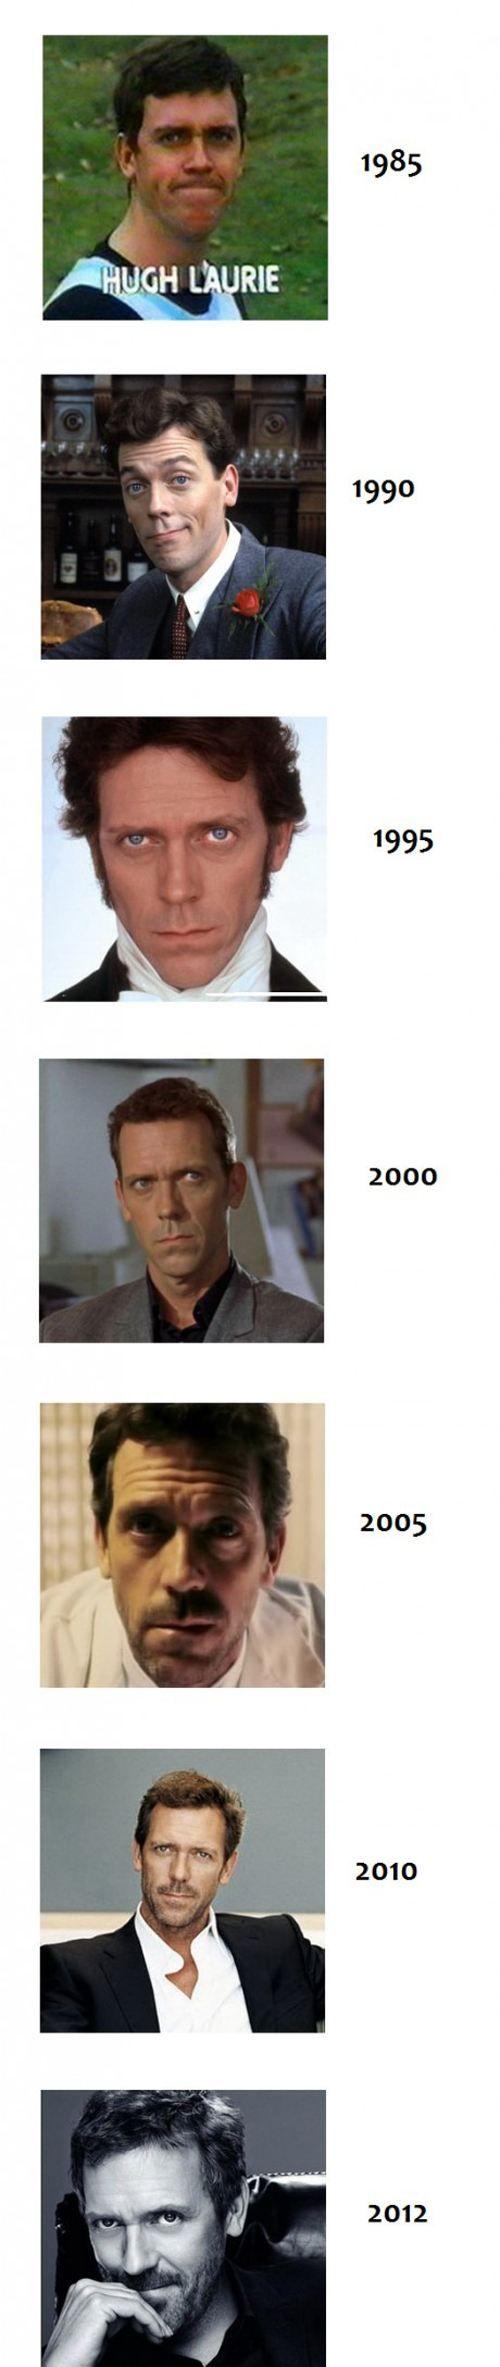 He certainly got better looking as he got older